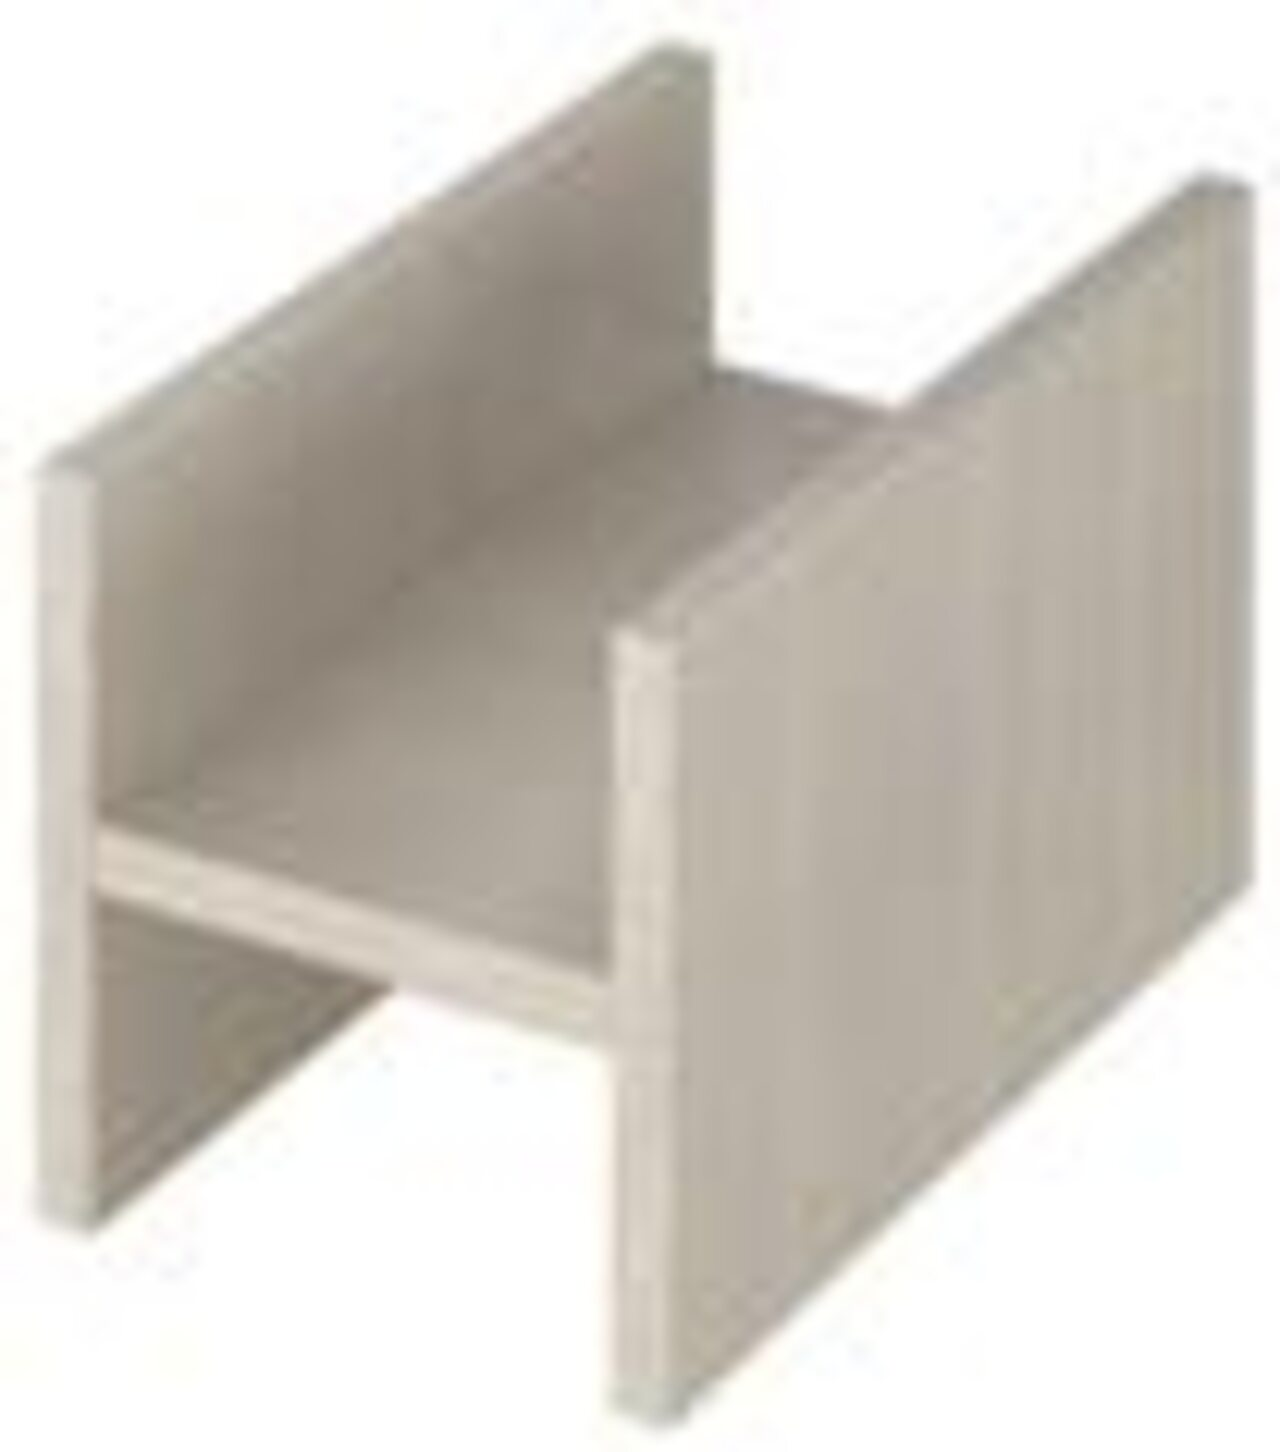 Подставка под системный блок  Аргентум 27x45x28 - фото 6